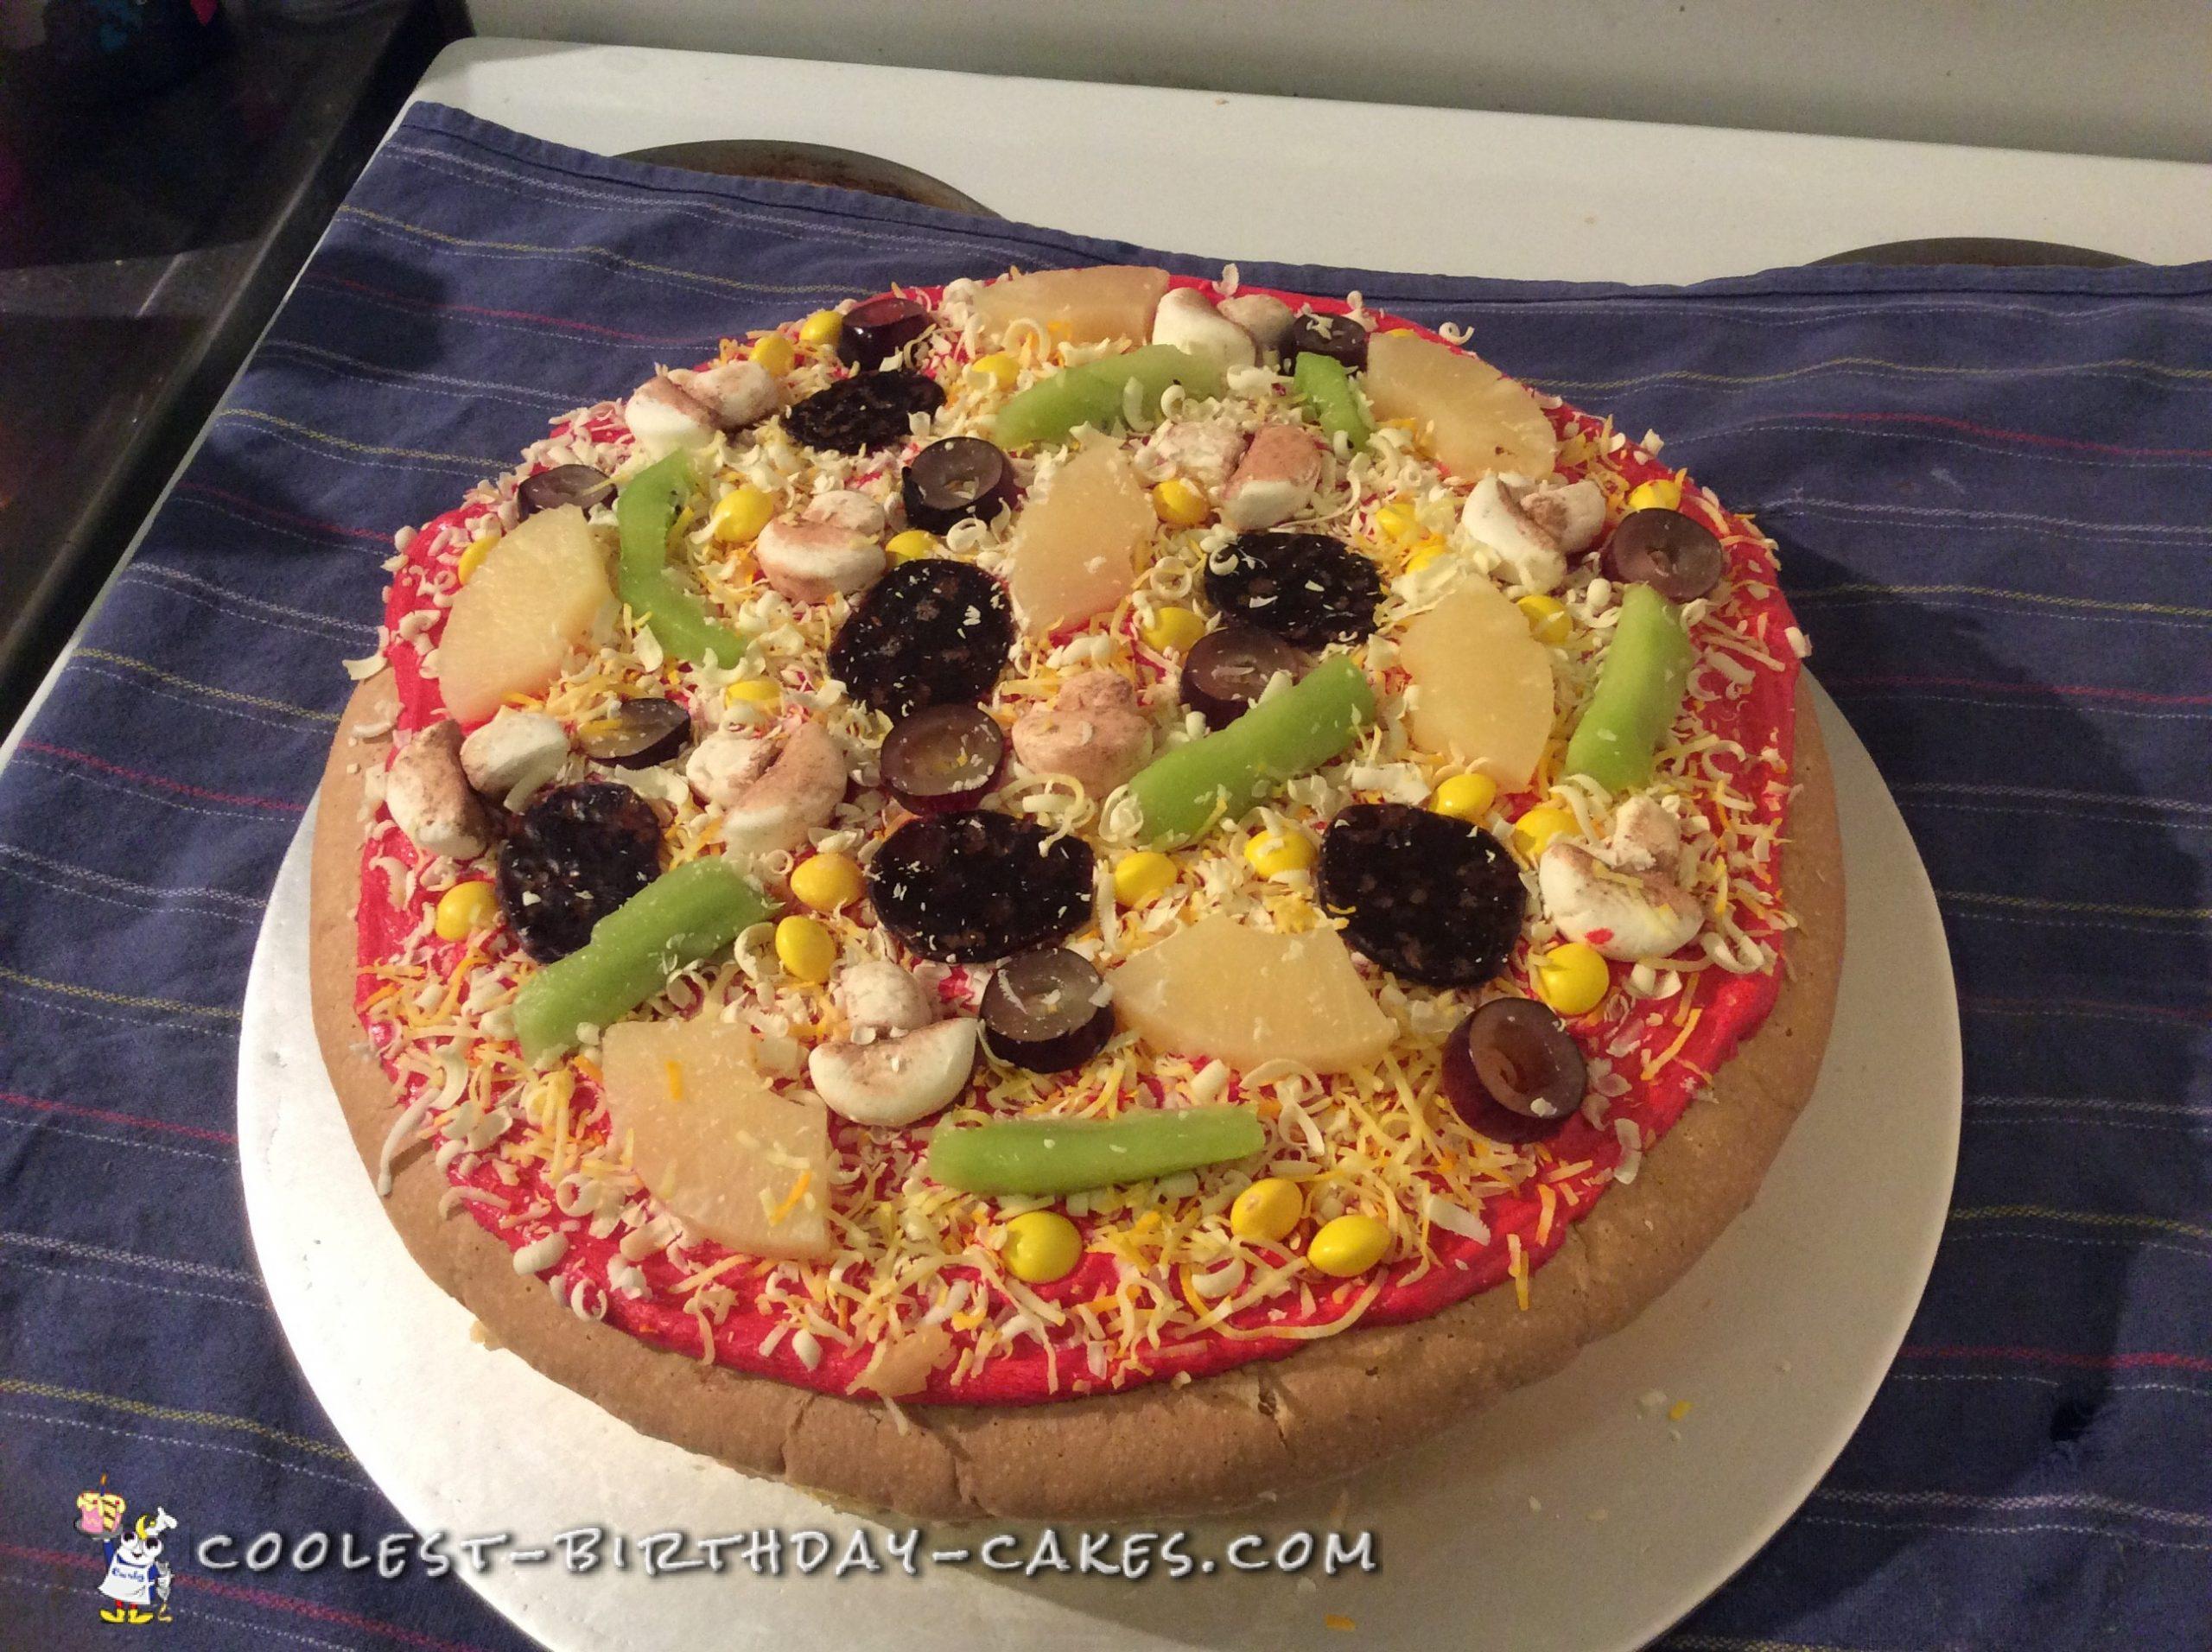 Pizza-licious Birthday Cake